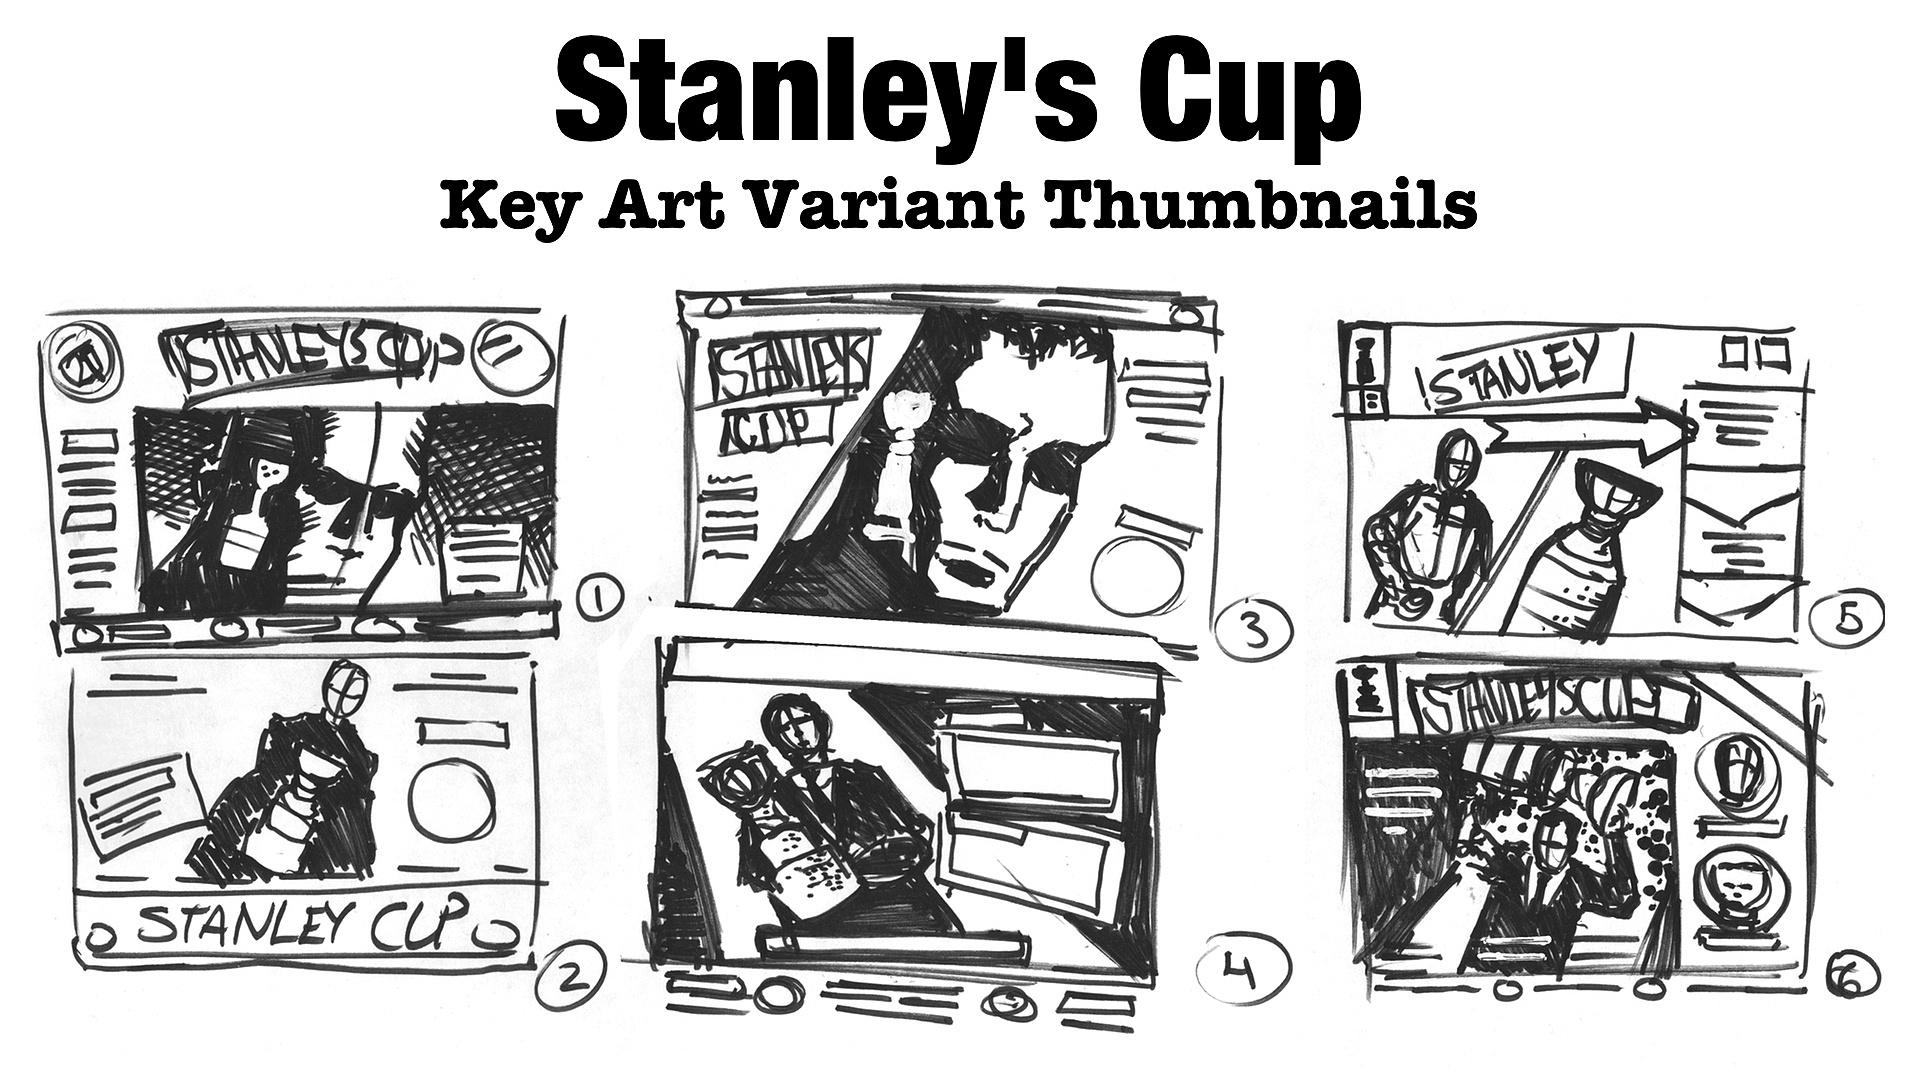 Key Art Variant Thumbnail Sketches